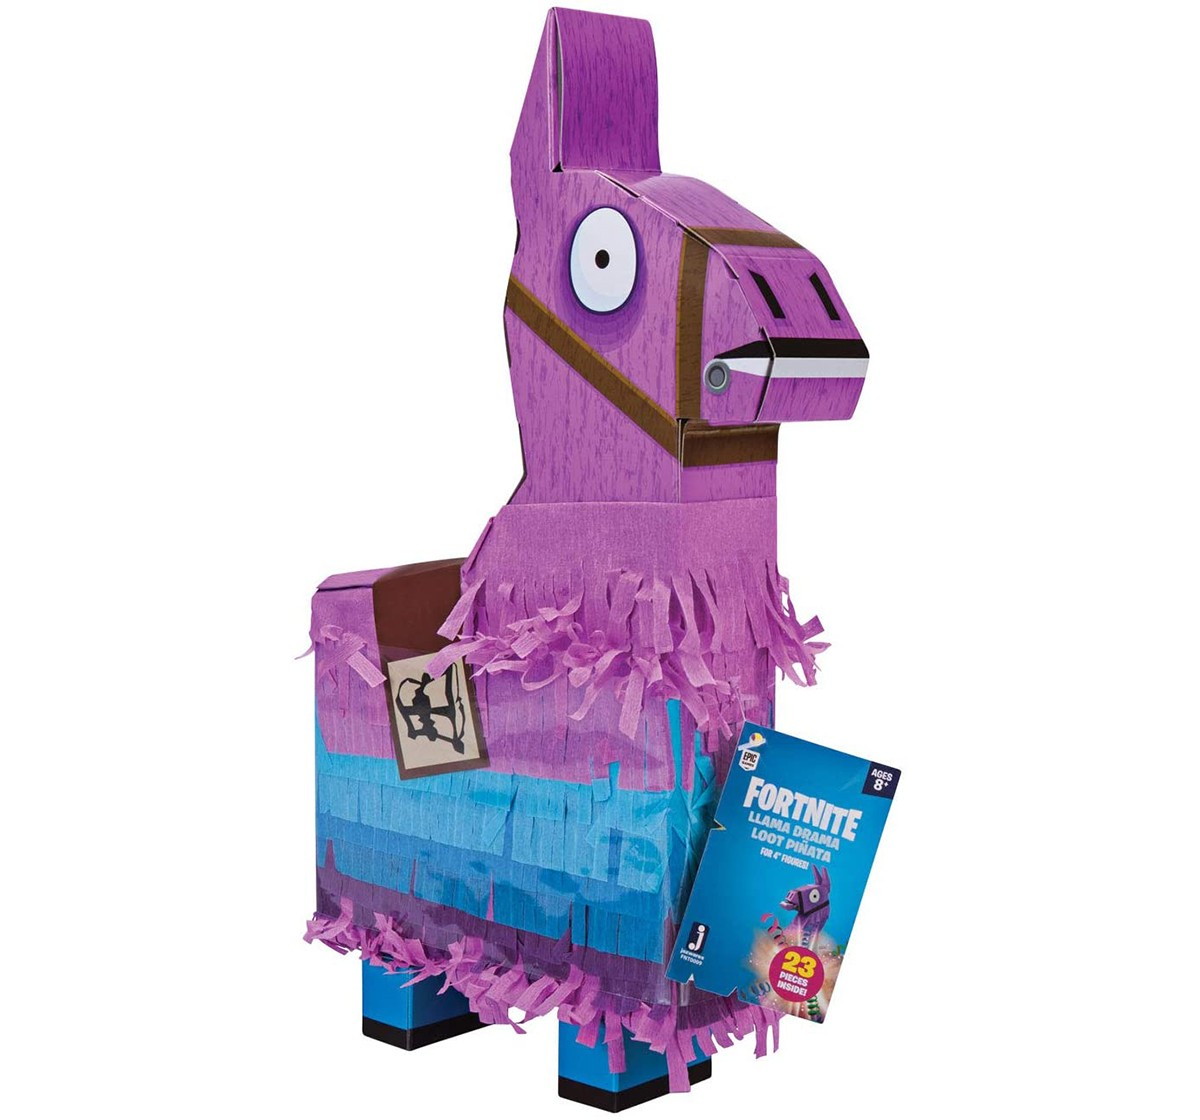 Fortnite Llama Drama Loot Piñata Action Figure Play Sets for Kids age 8Y+